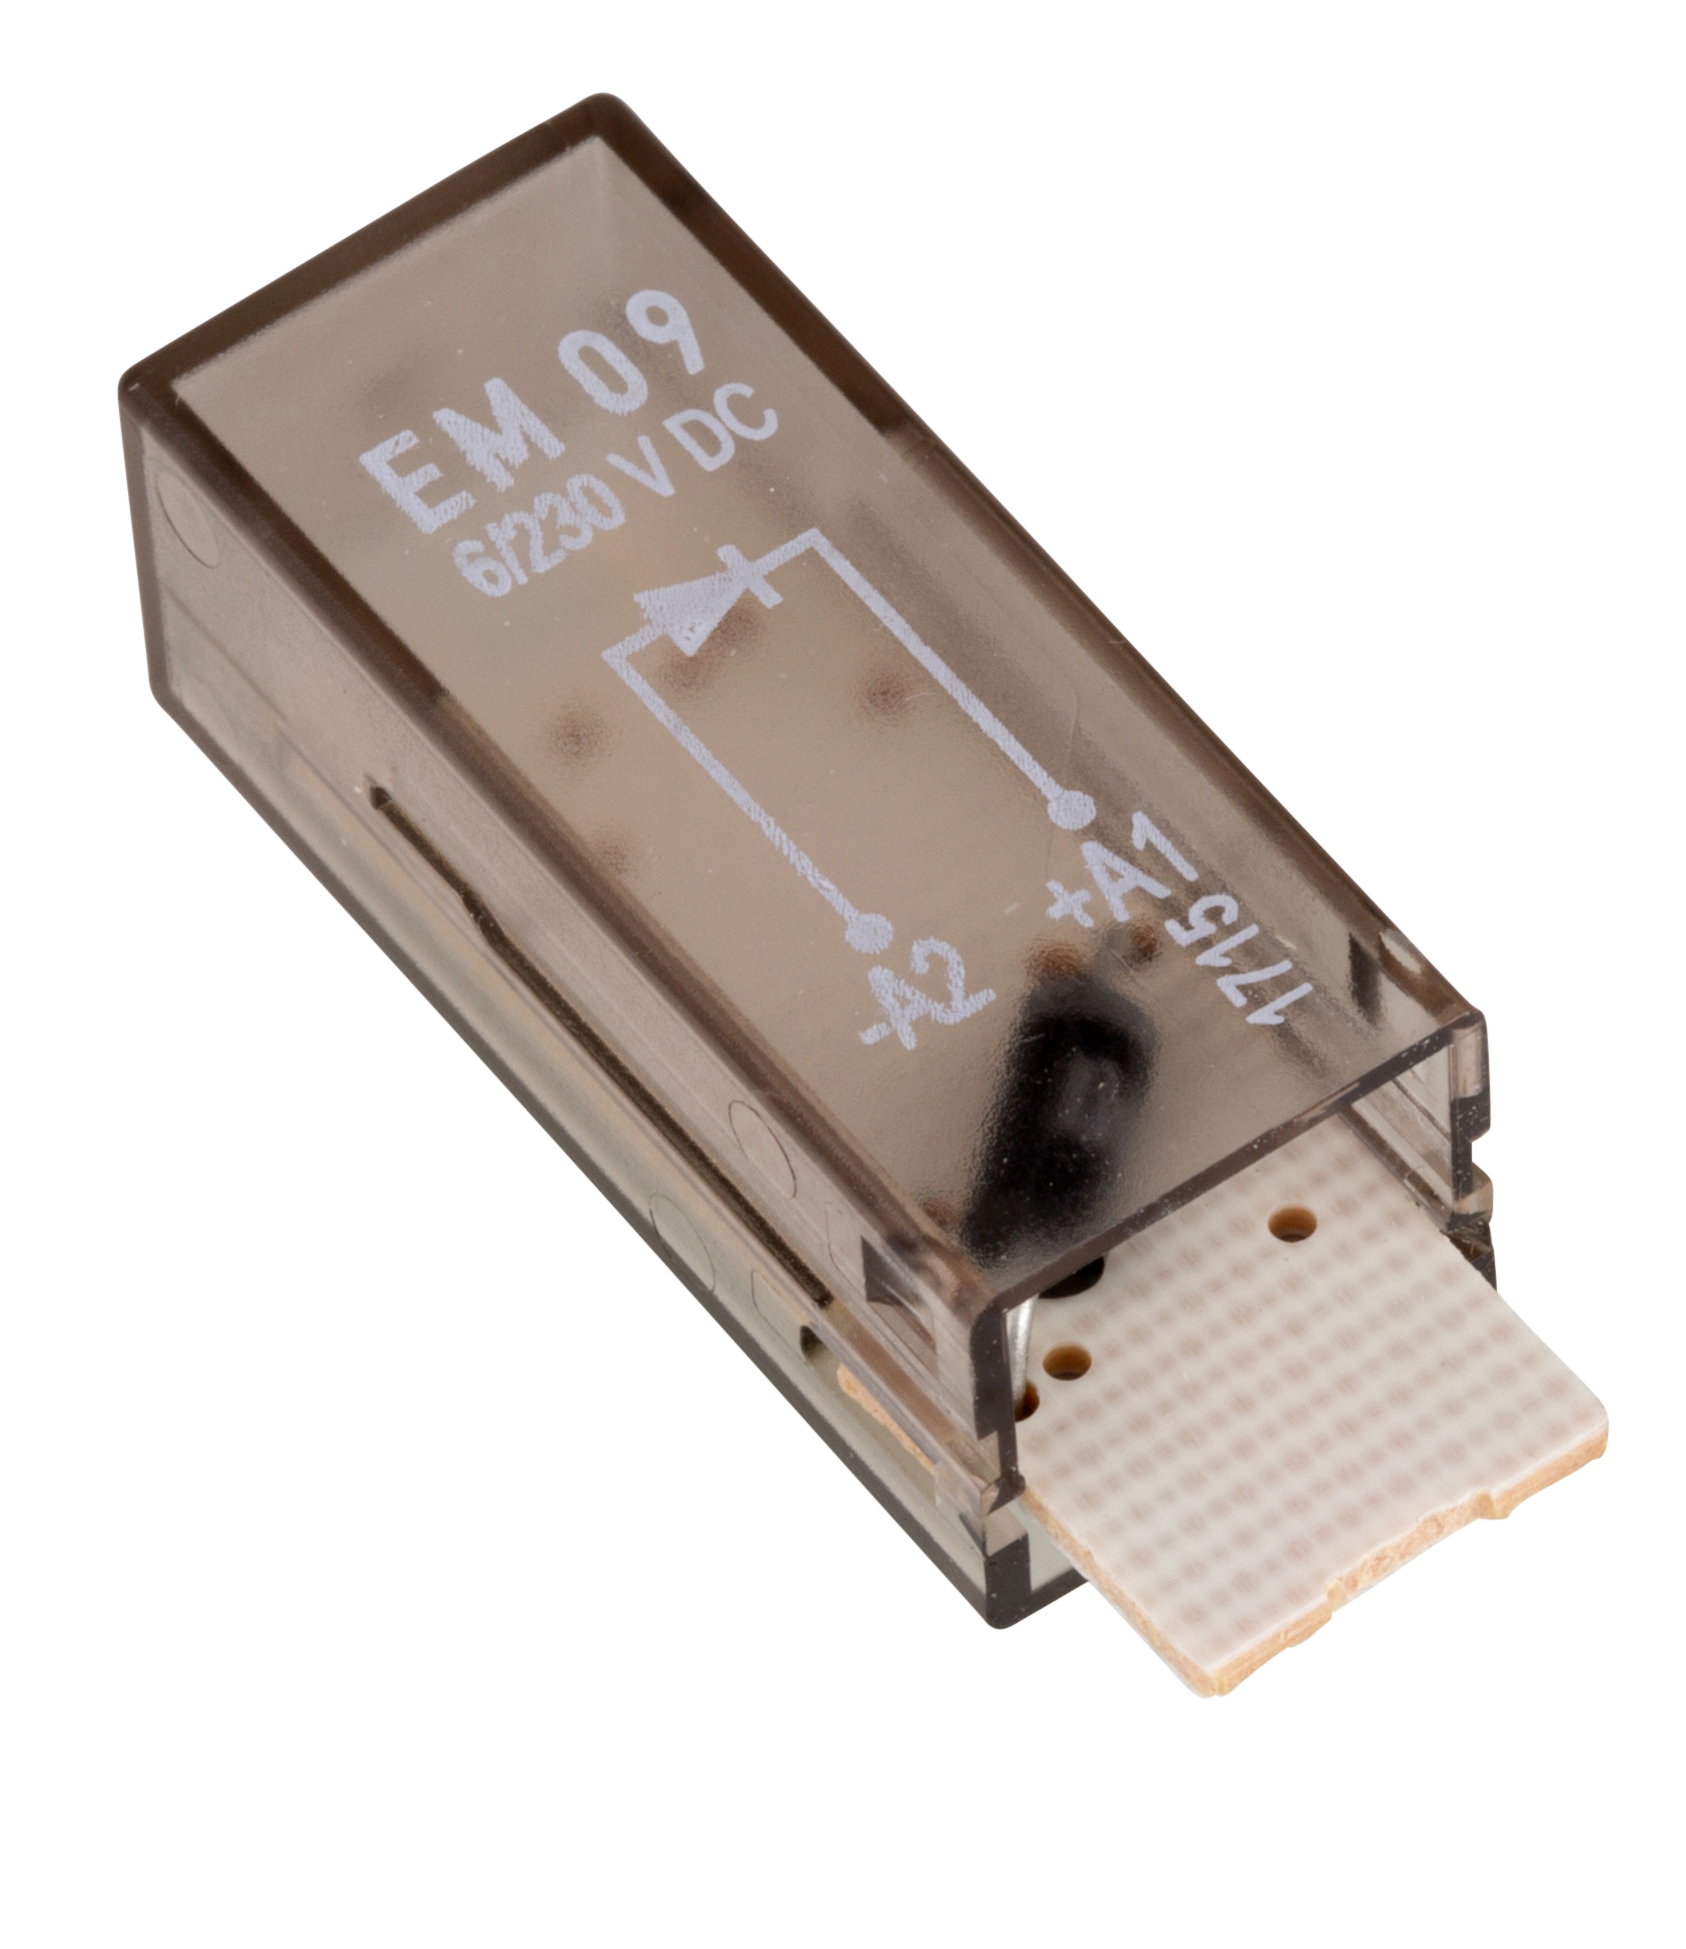 1 Stk Freilaufdioden-Modul 6-230V DC, A1+, EM09 YMFDG230--